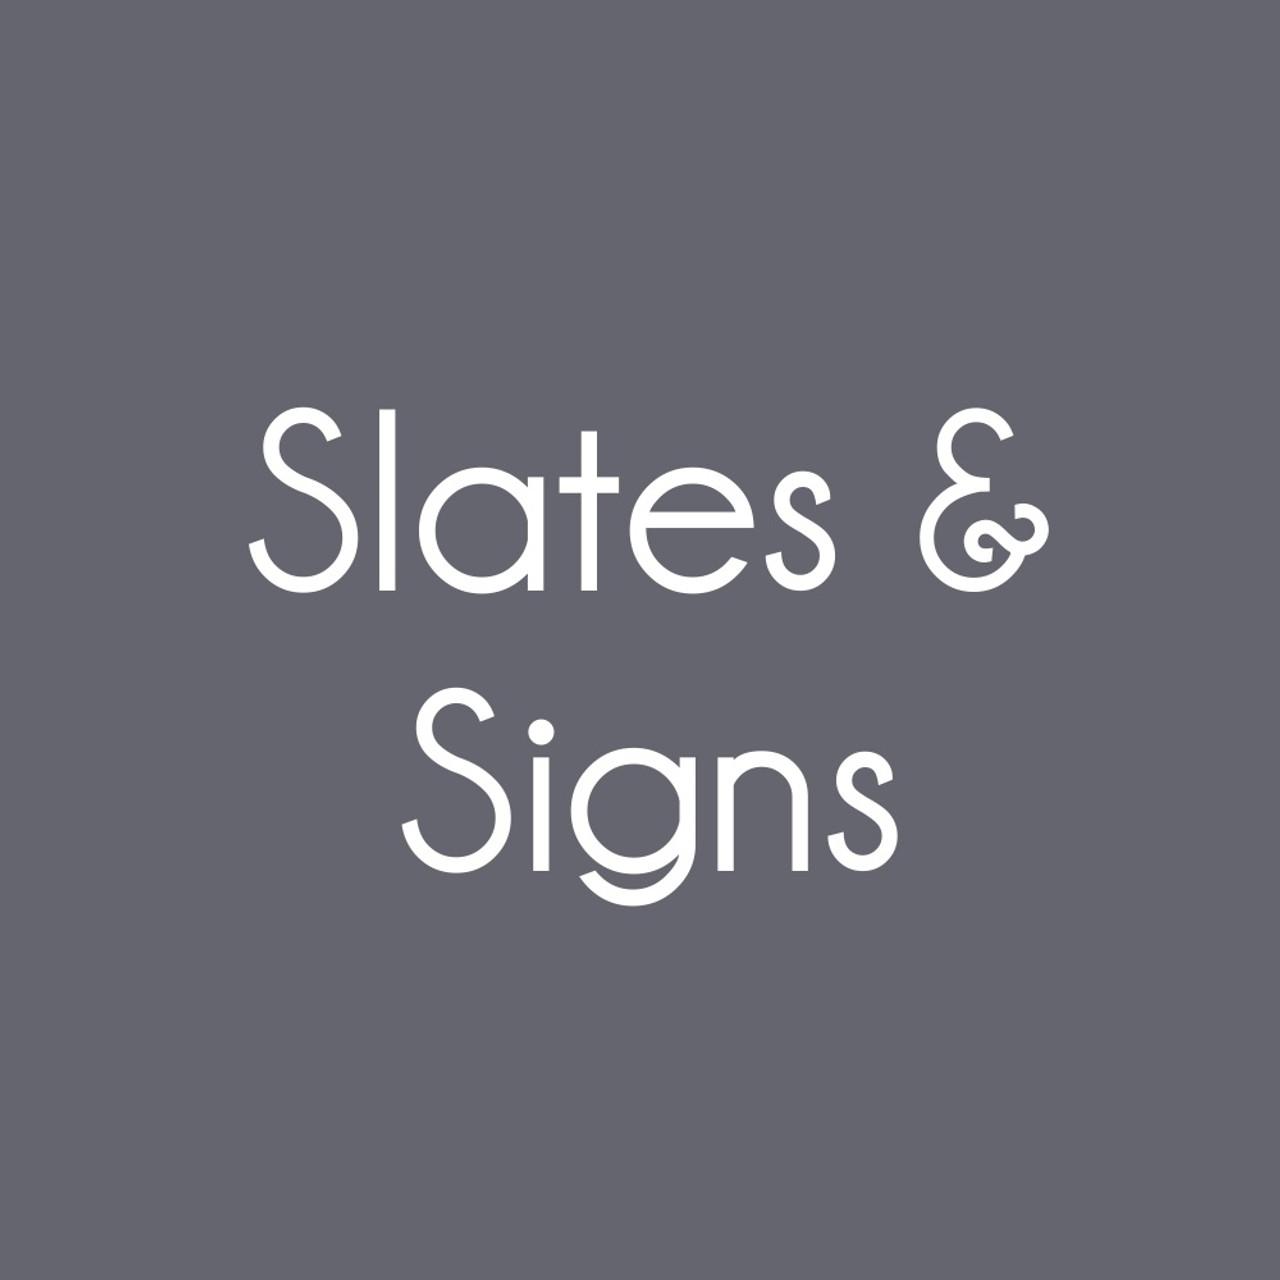 Slates & Signs